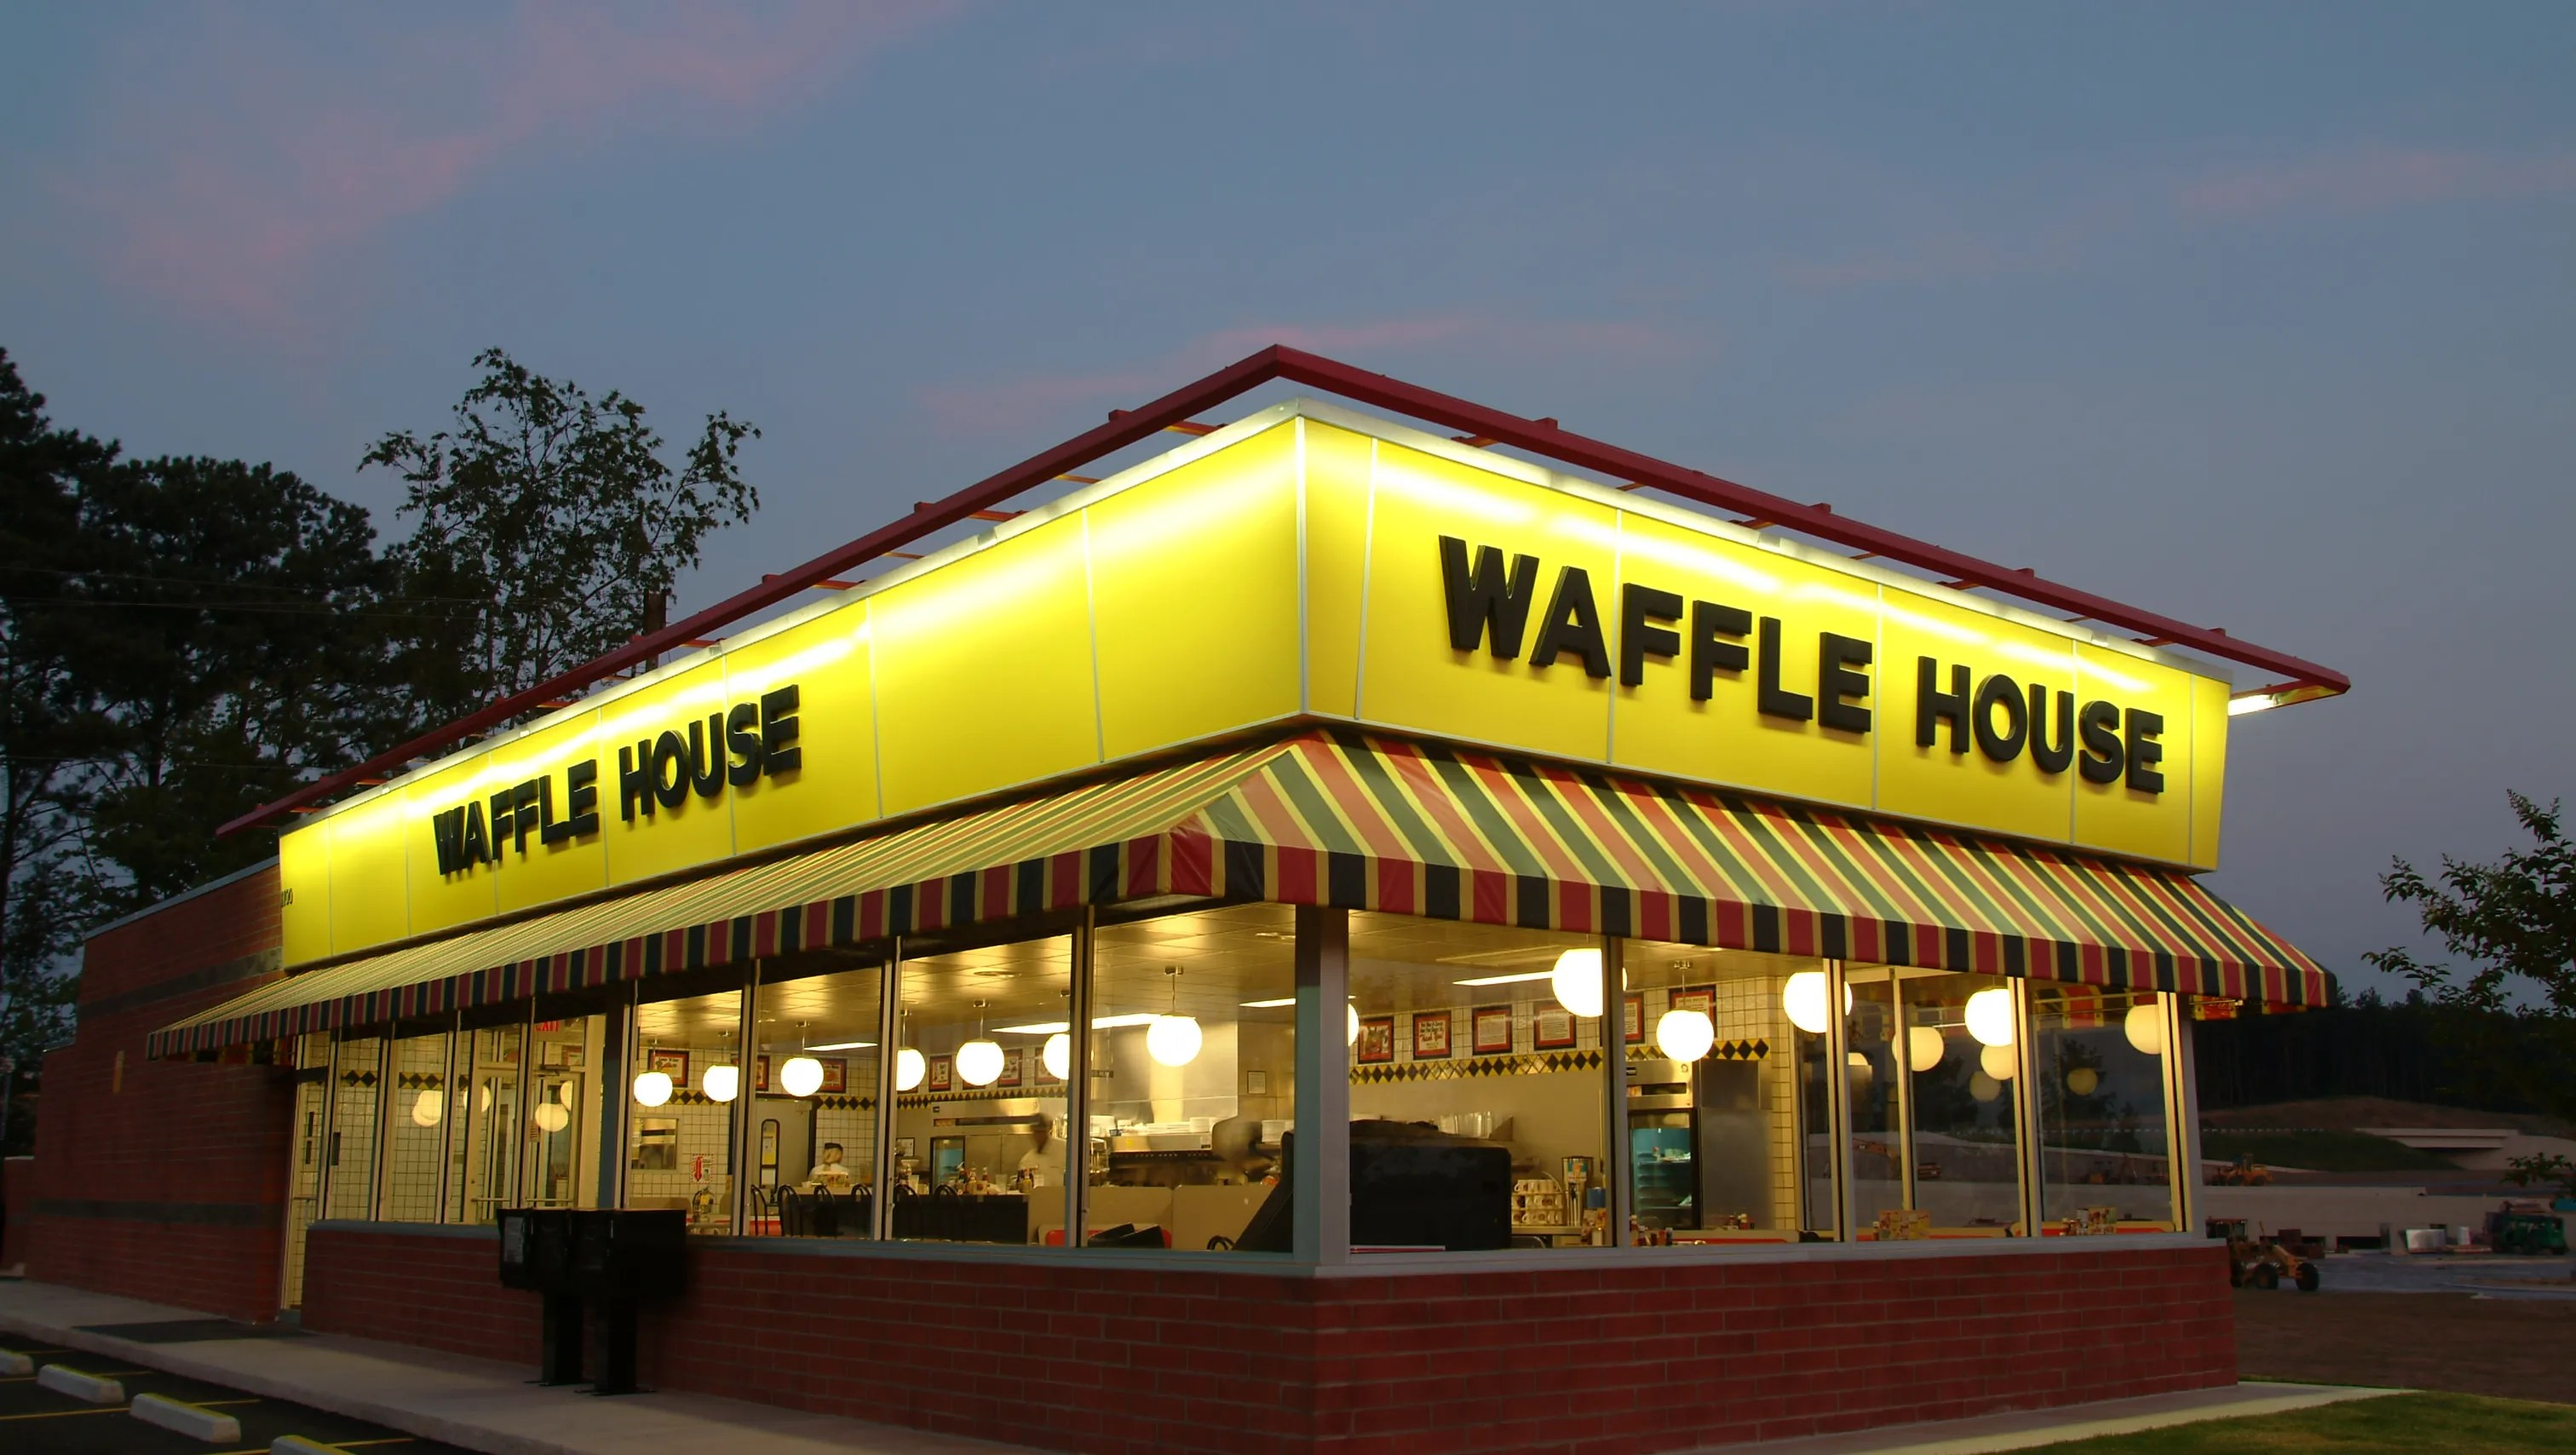 Hurricane Irma How Fema Uses Waffle Houses In Disasters